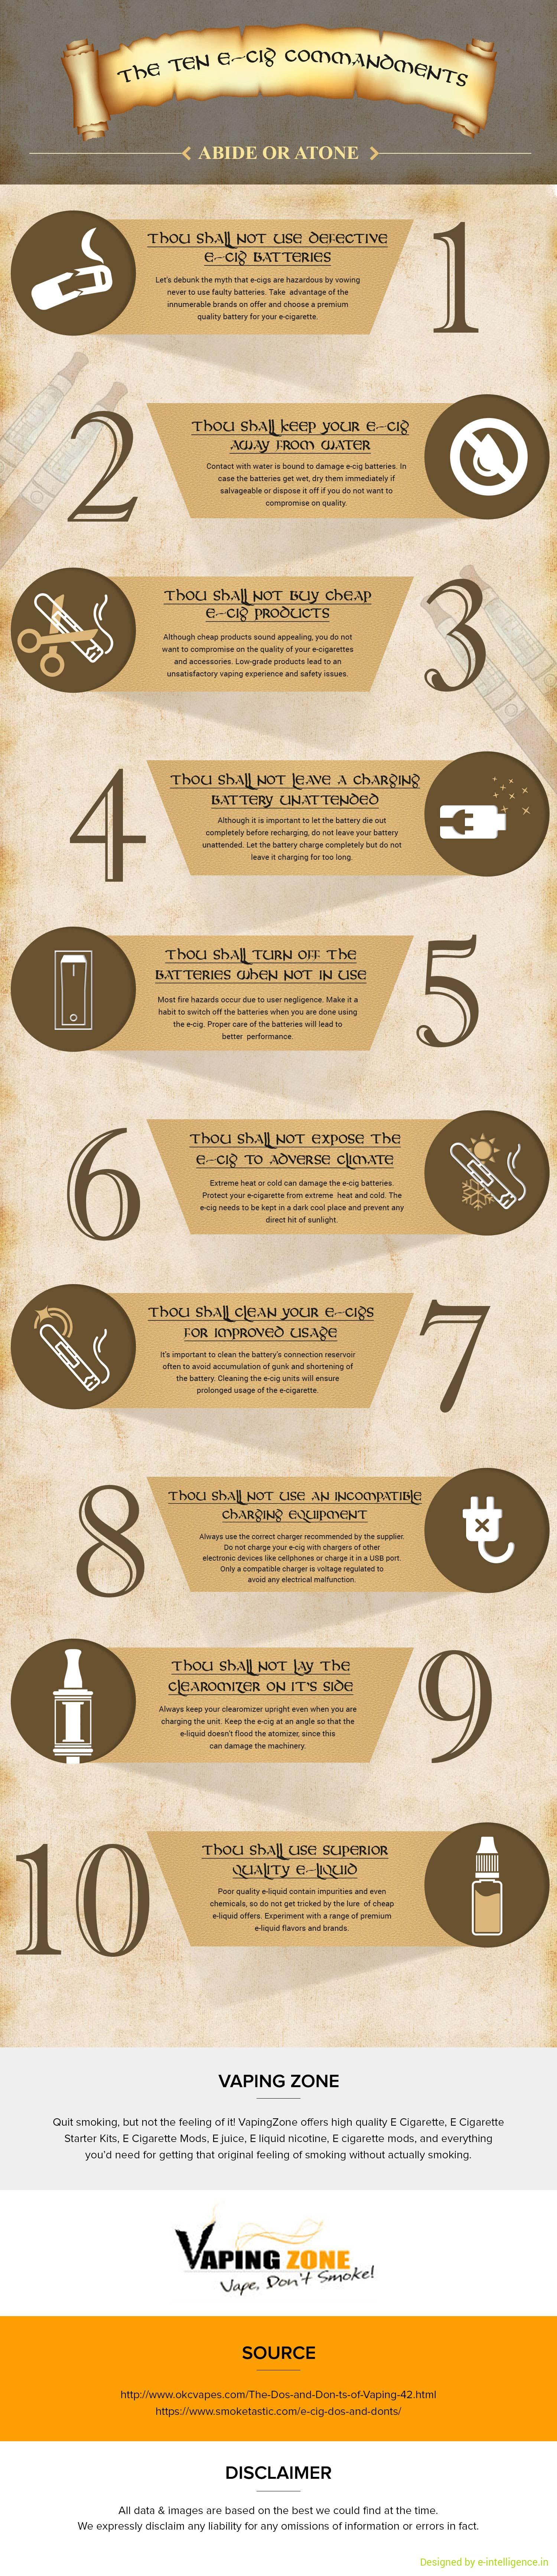 The 10 E-Cig Commandments, Rules For Vapers